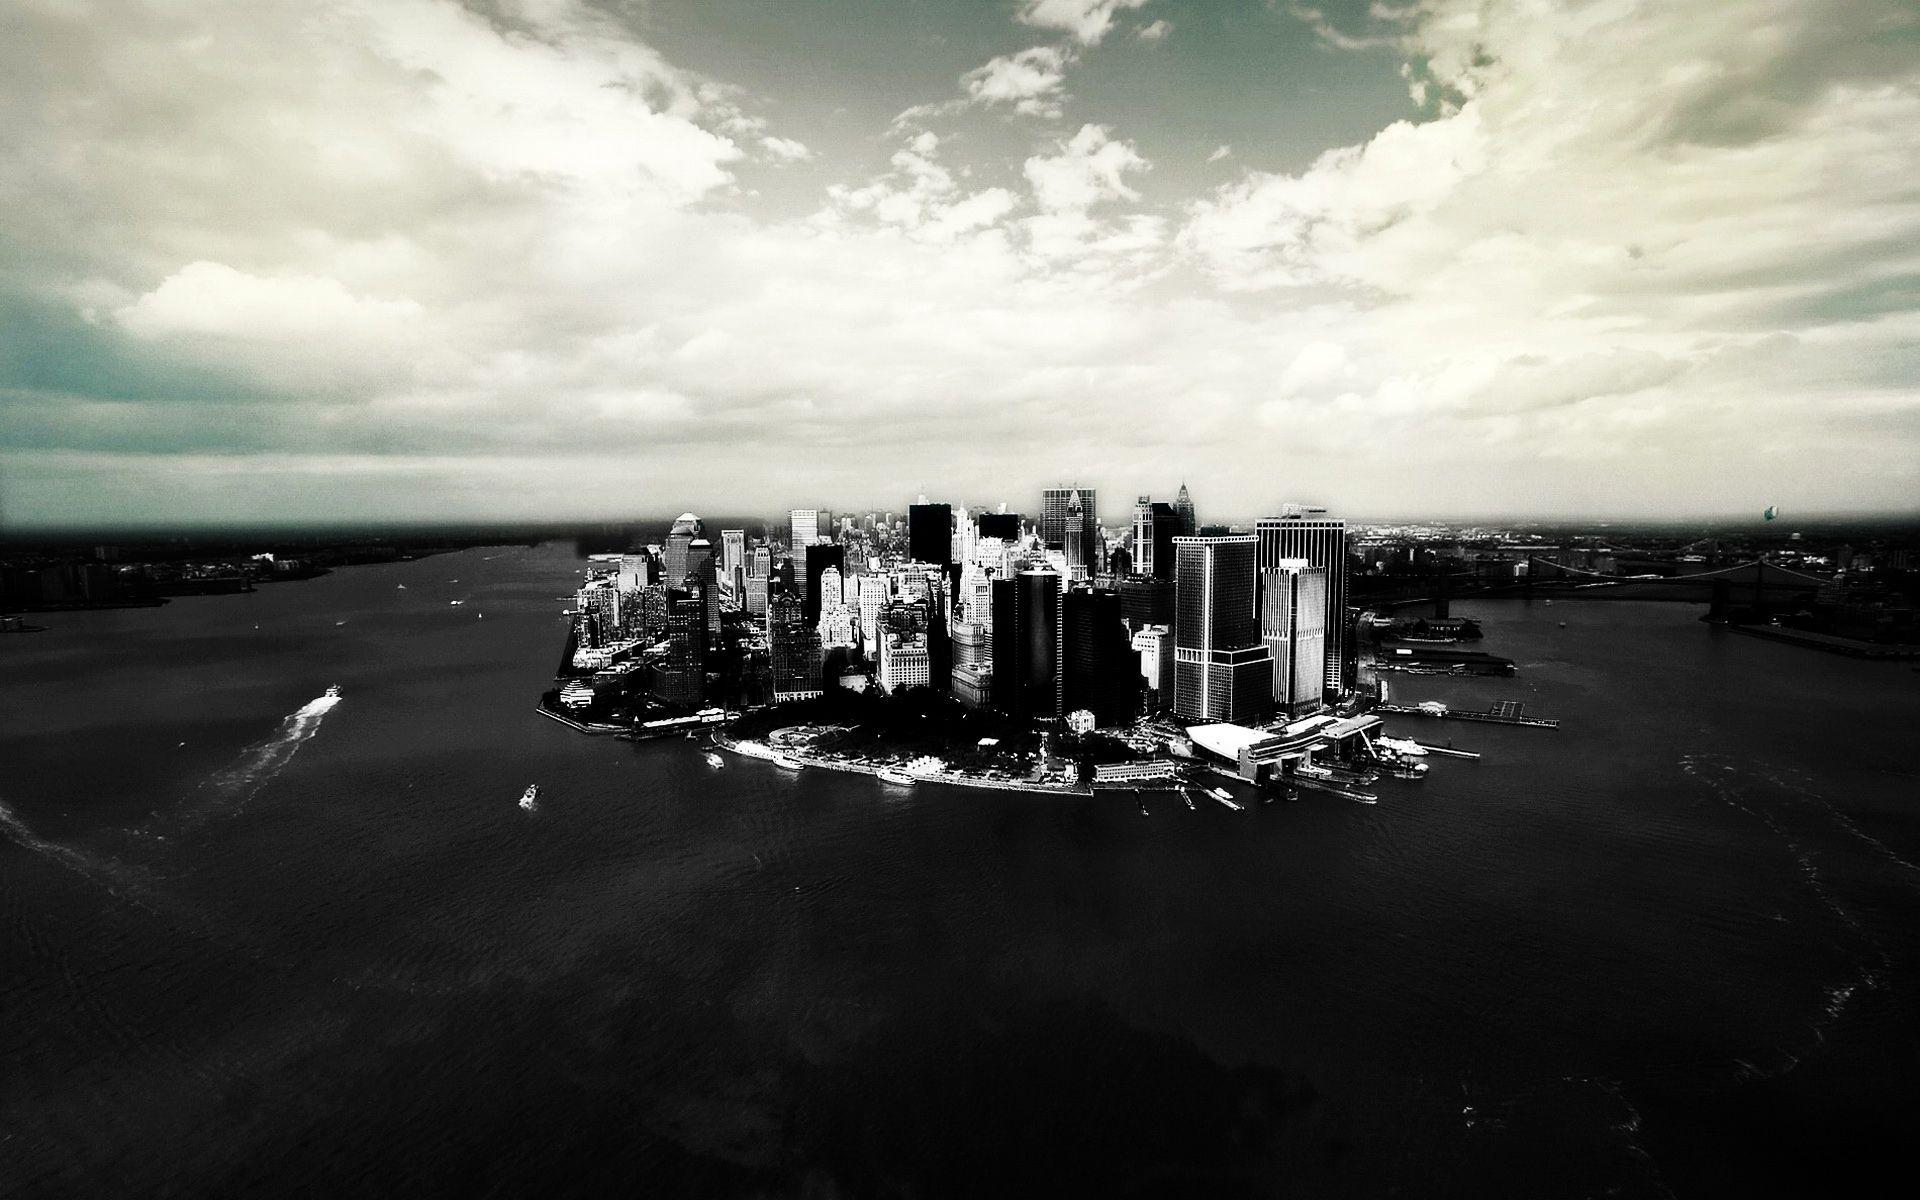 14501-Lower-Manhattan-(www.WallpaperMotion.com).jpg (1920×1200)